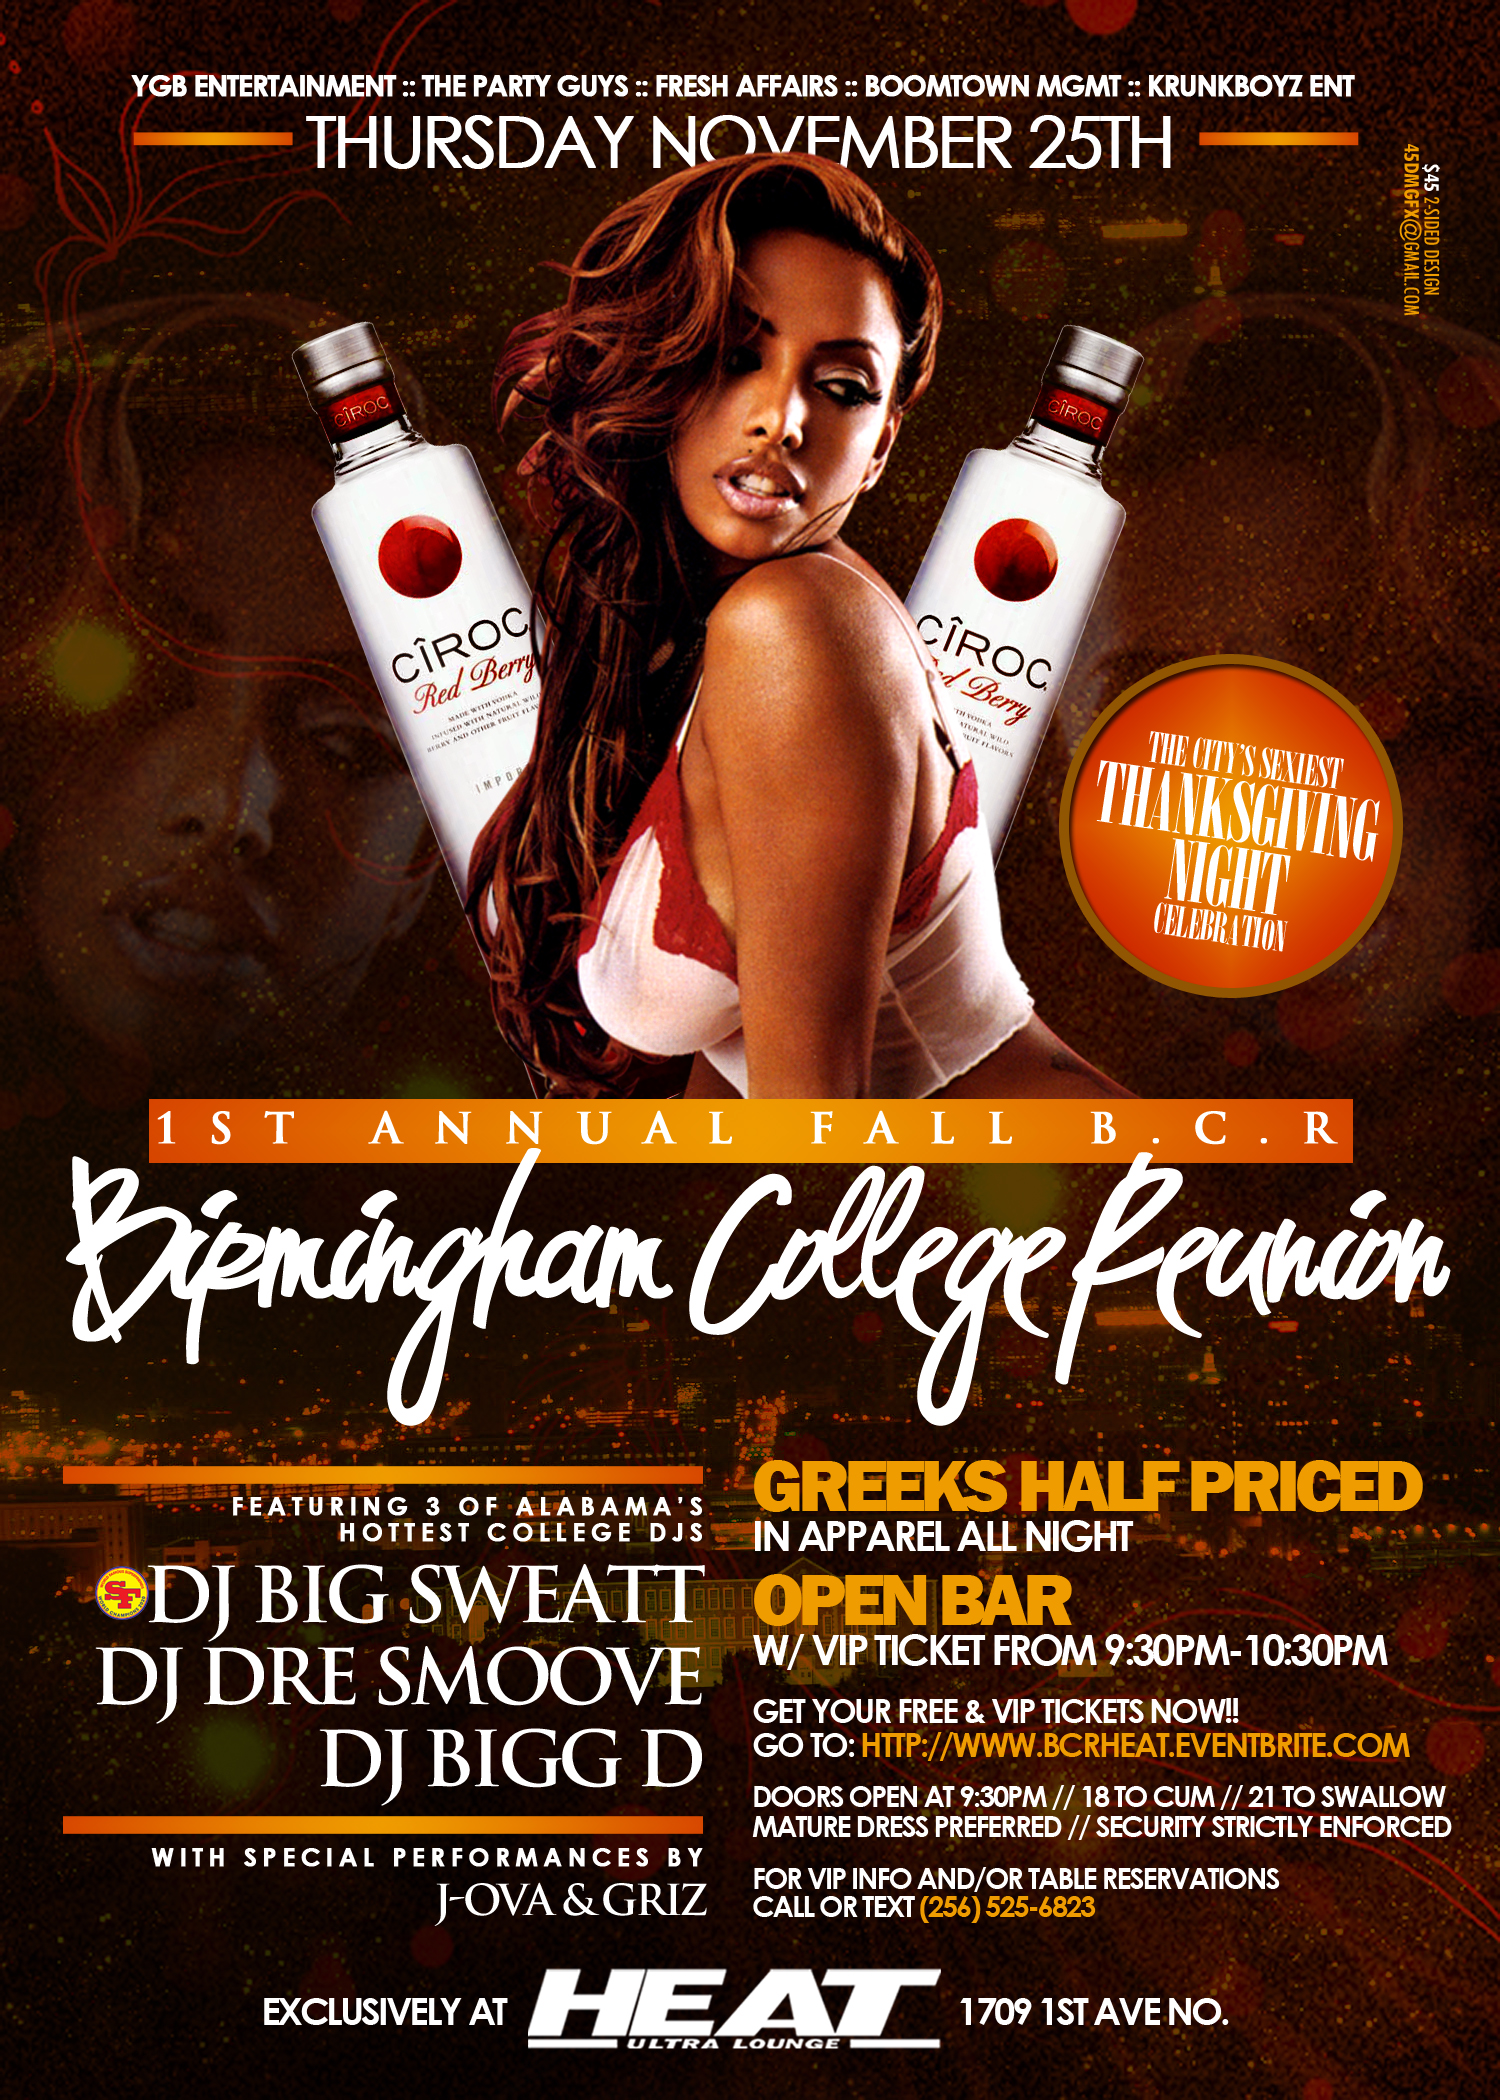 Birmingham College Reunion Flyer